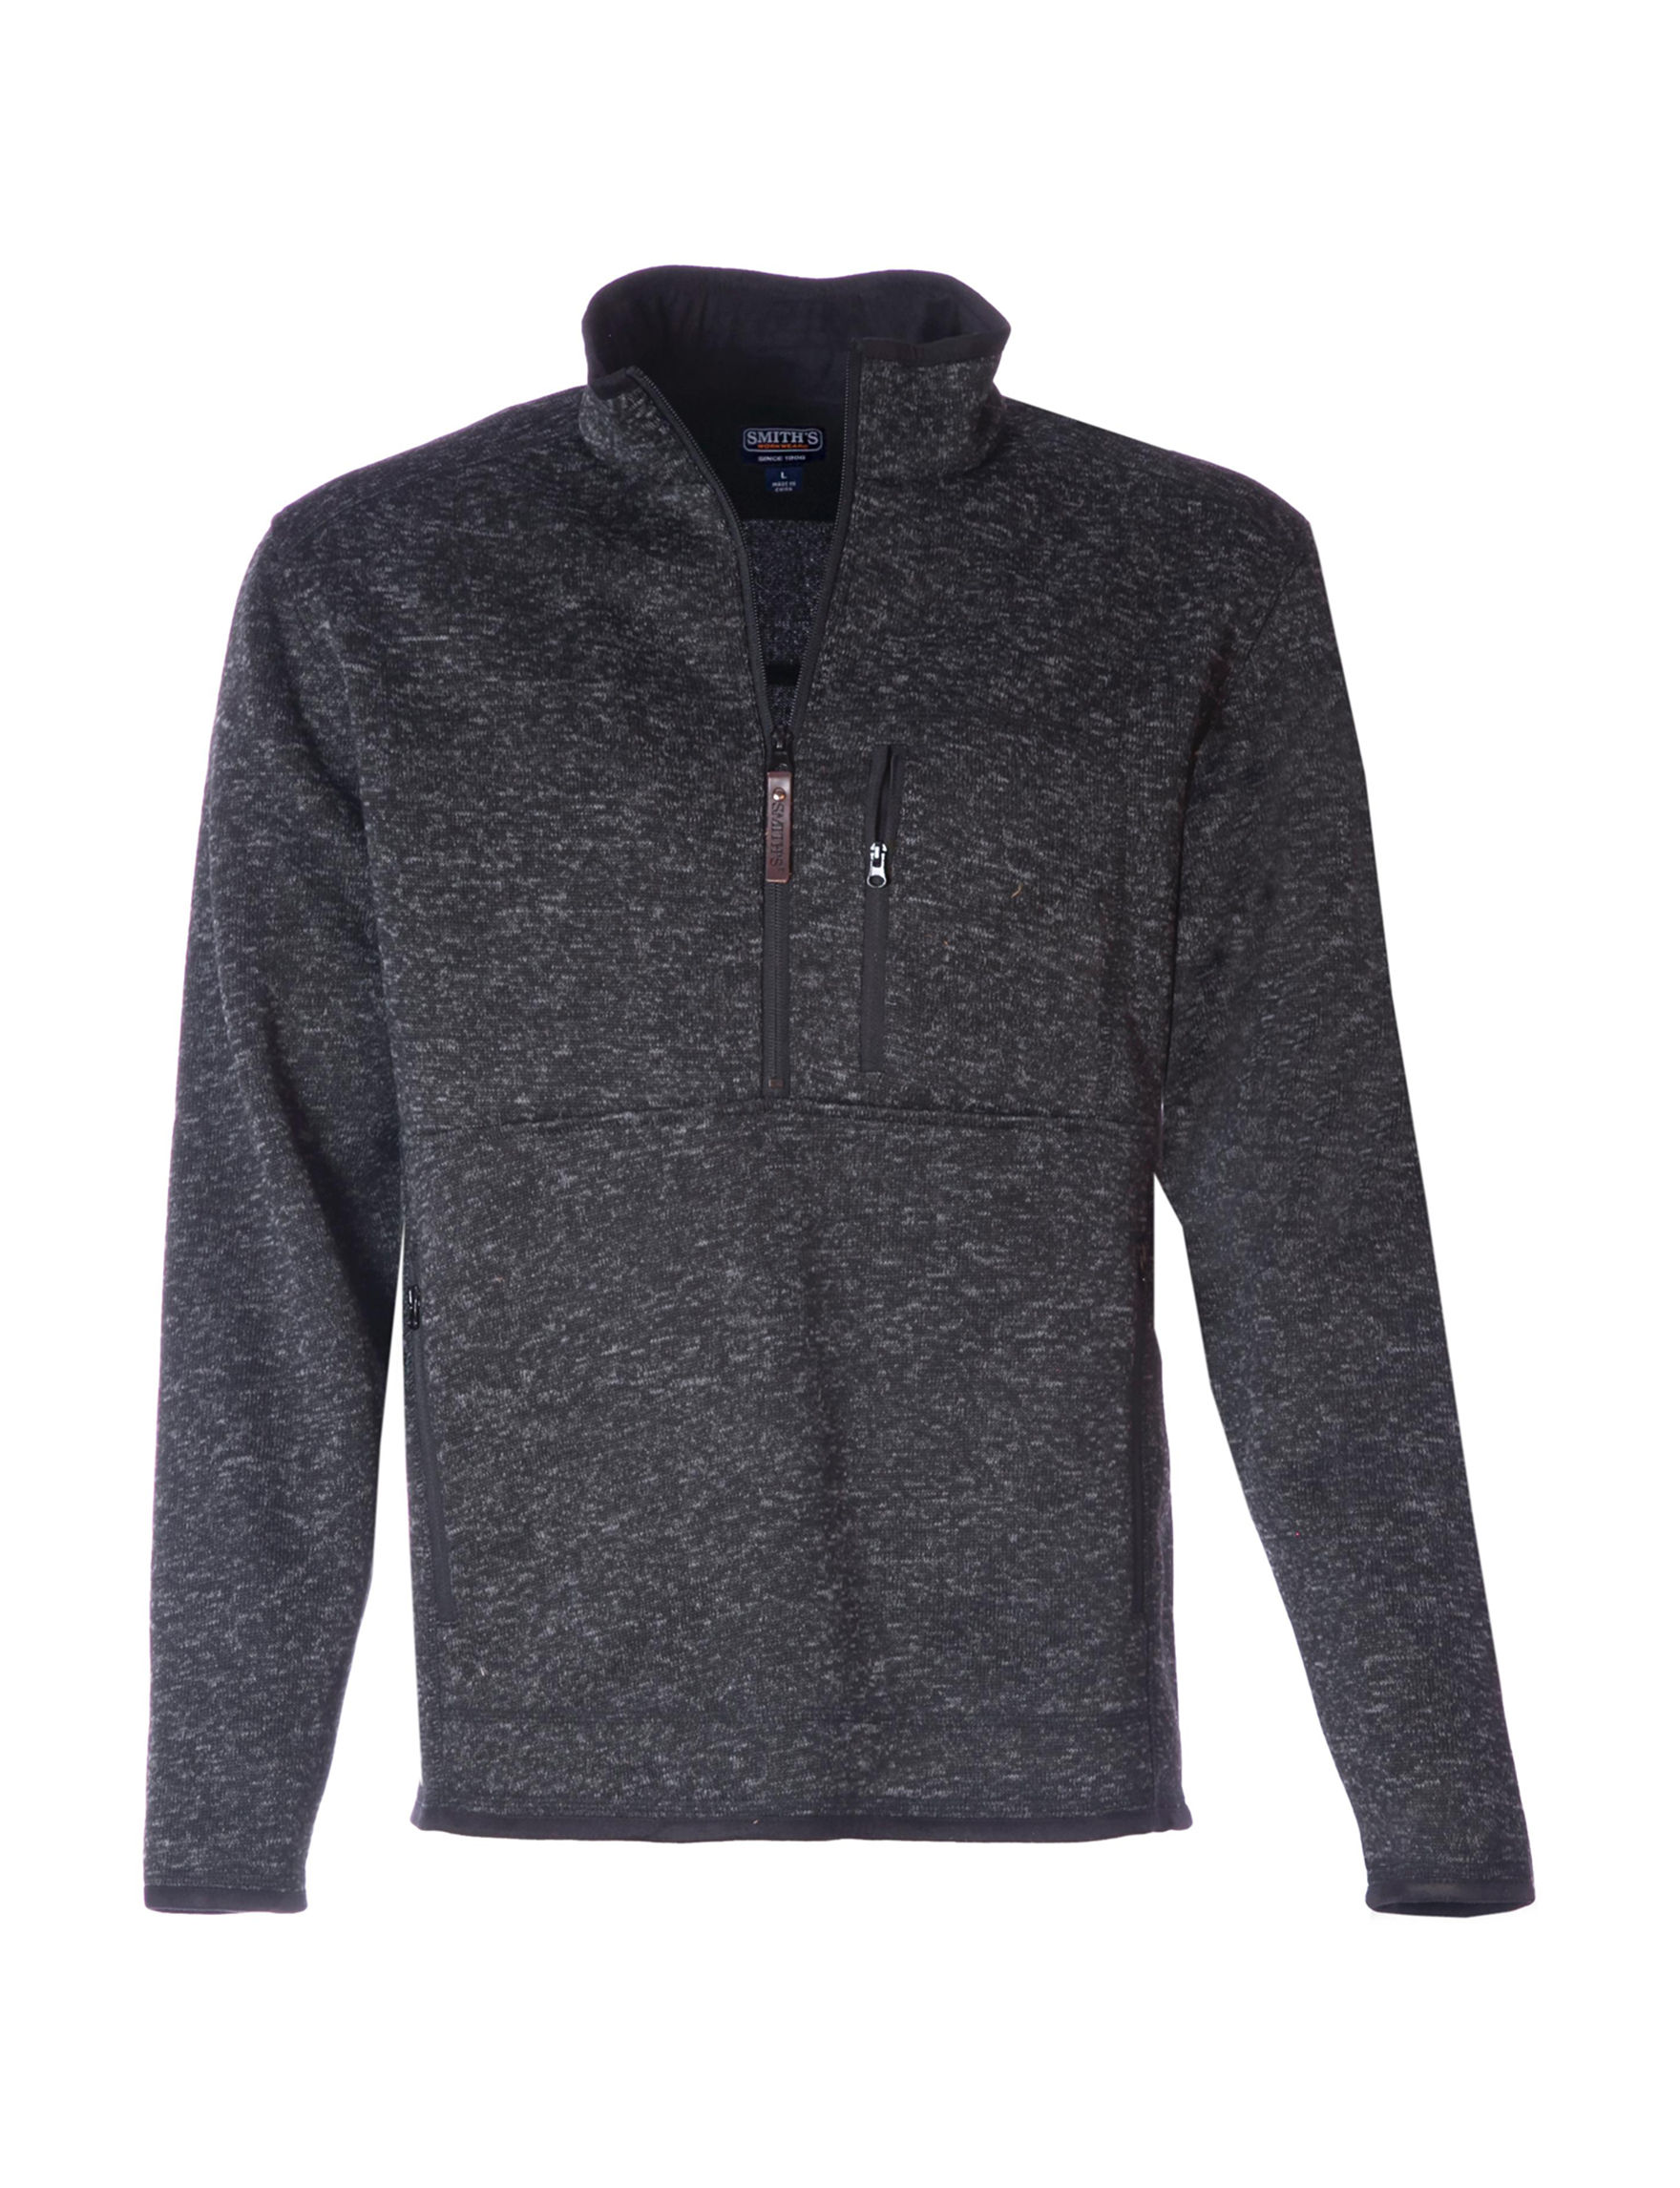 Smith's Workwear Black Fleece & Soft Shell Jackets